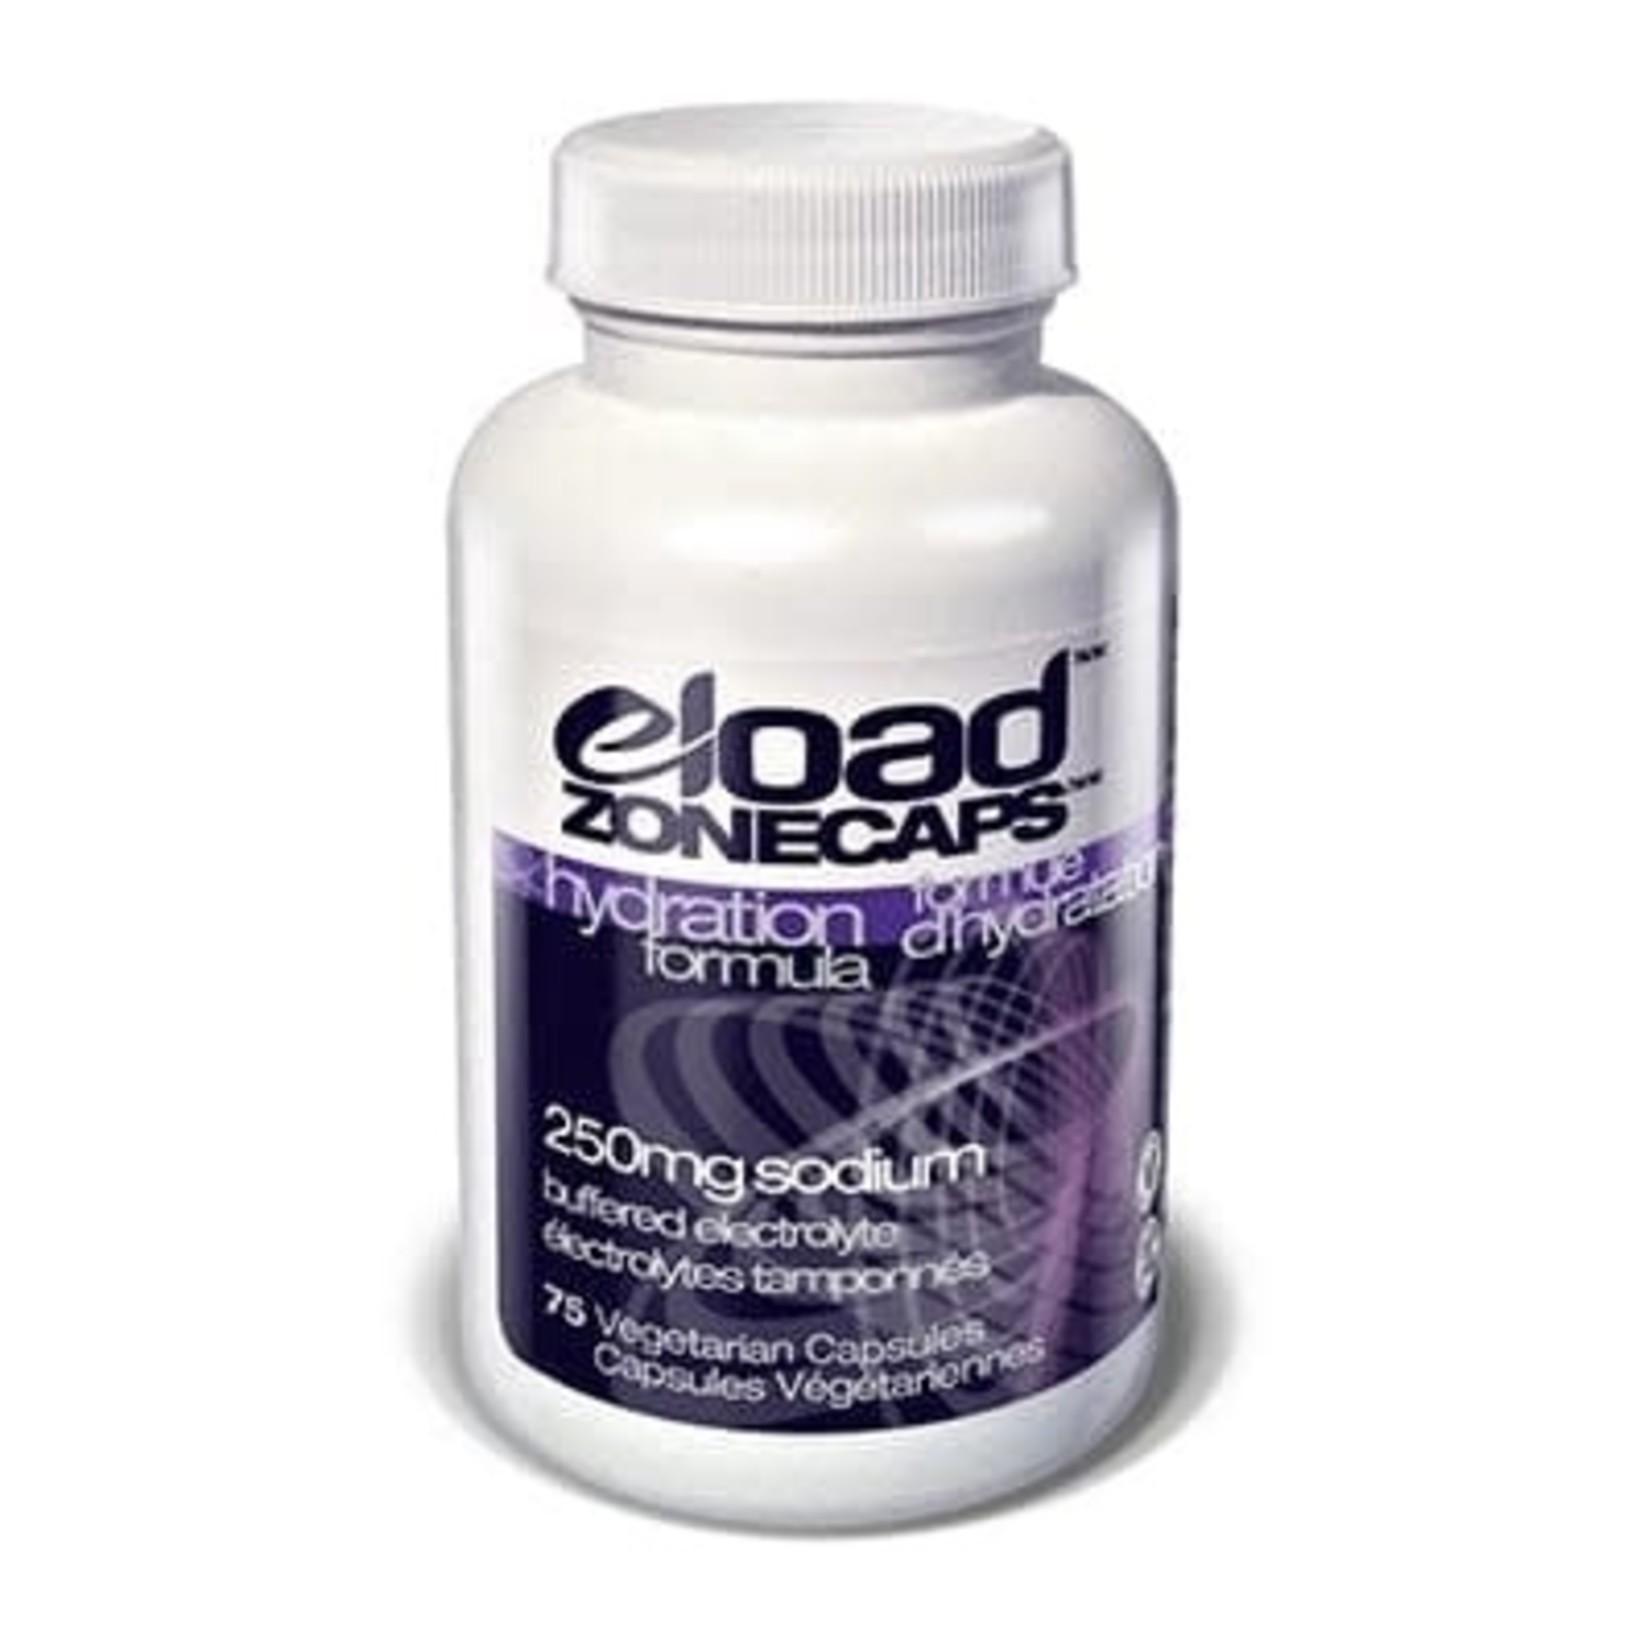 Eload Eload Hydration Formula Zone Caps